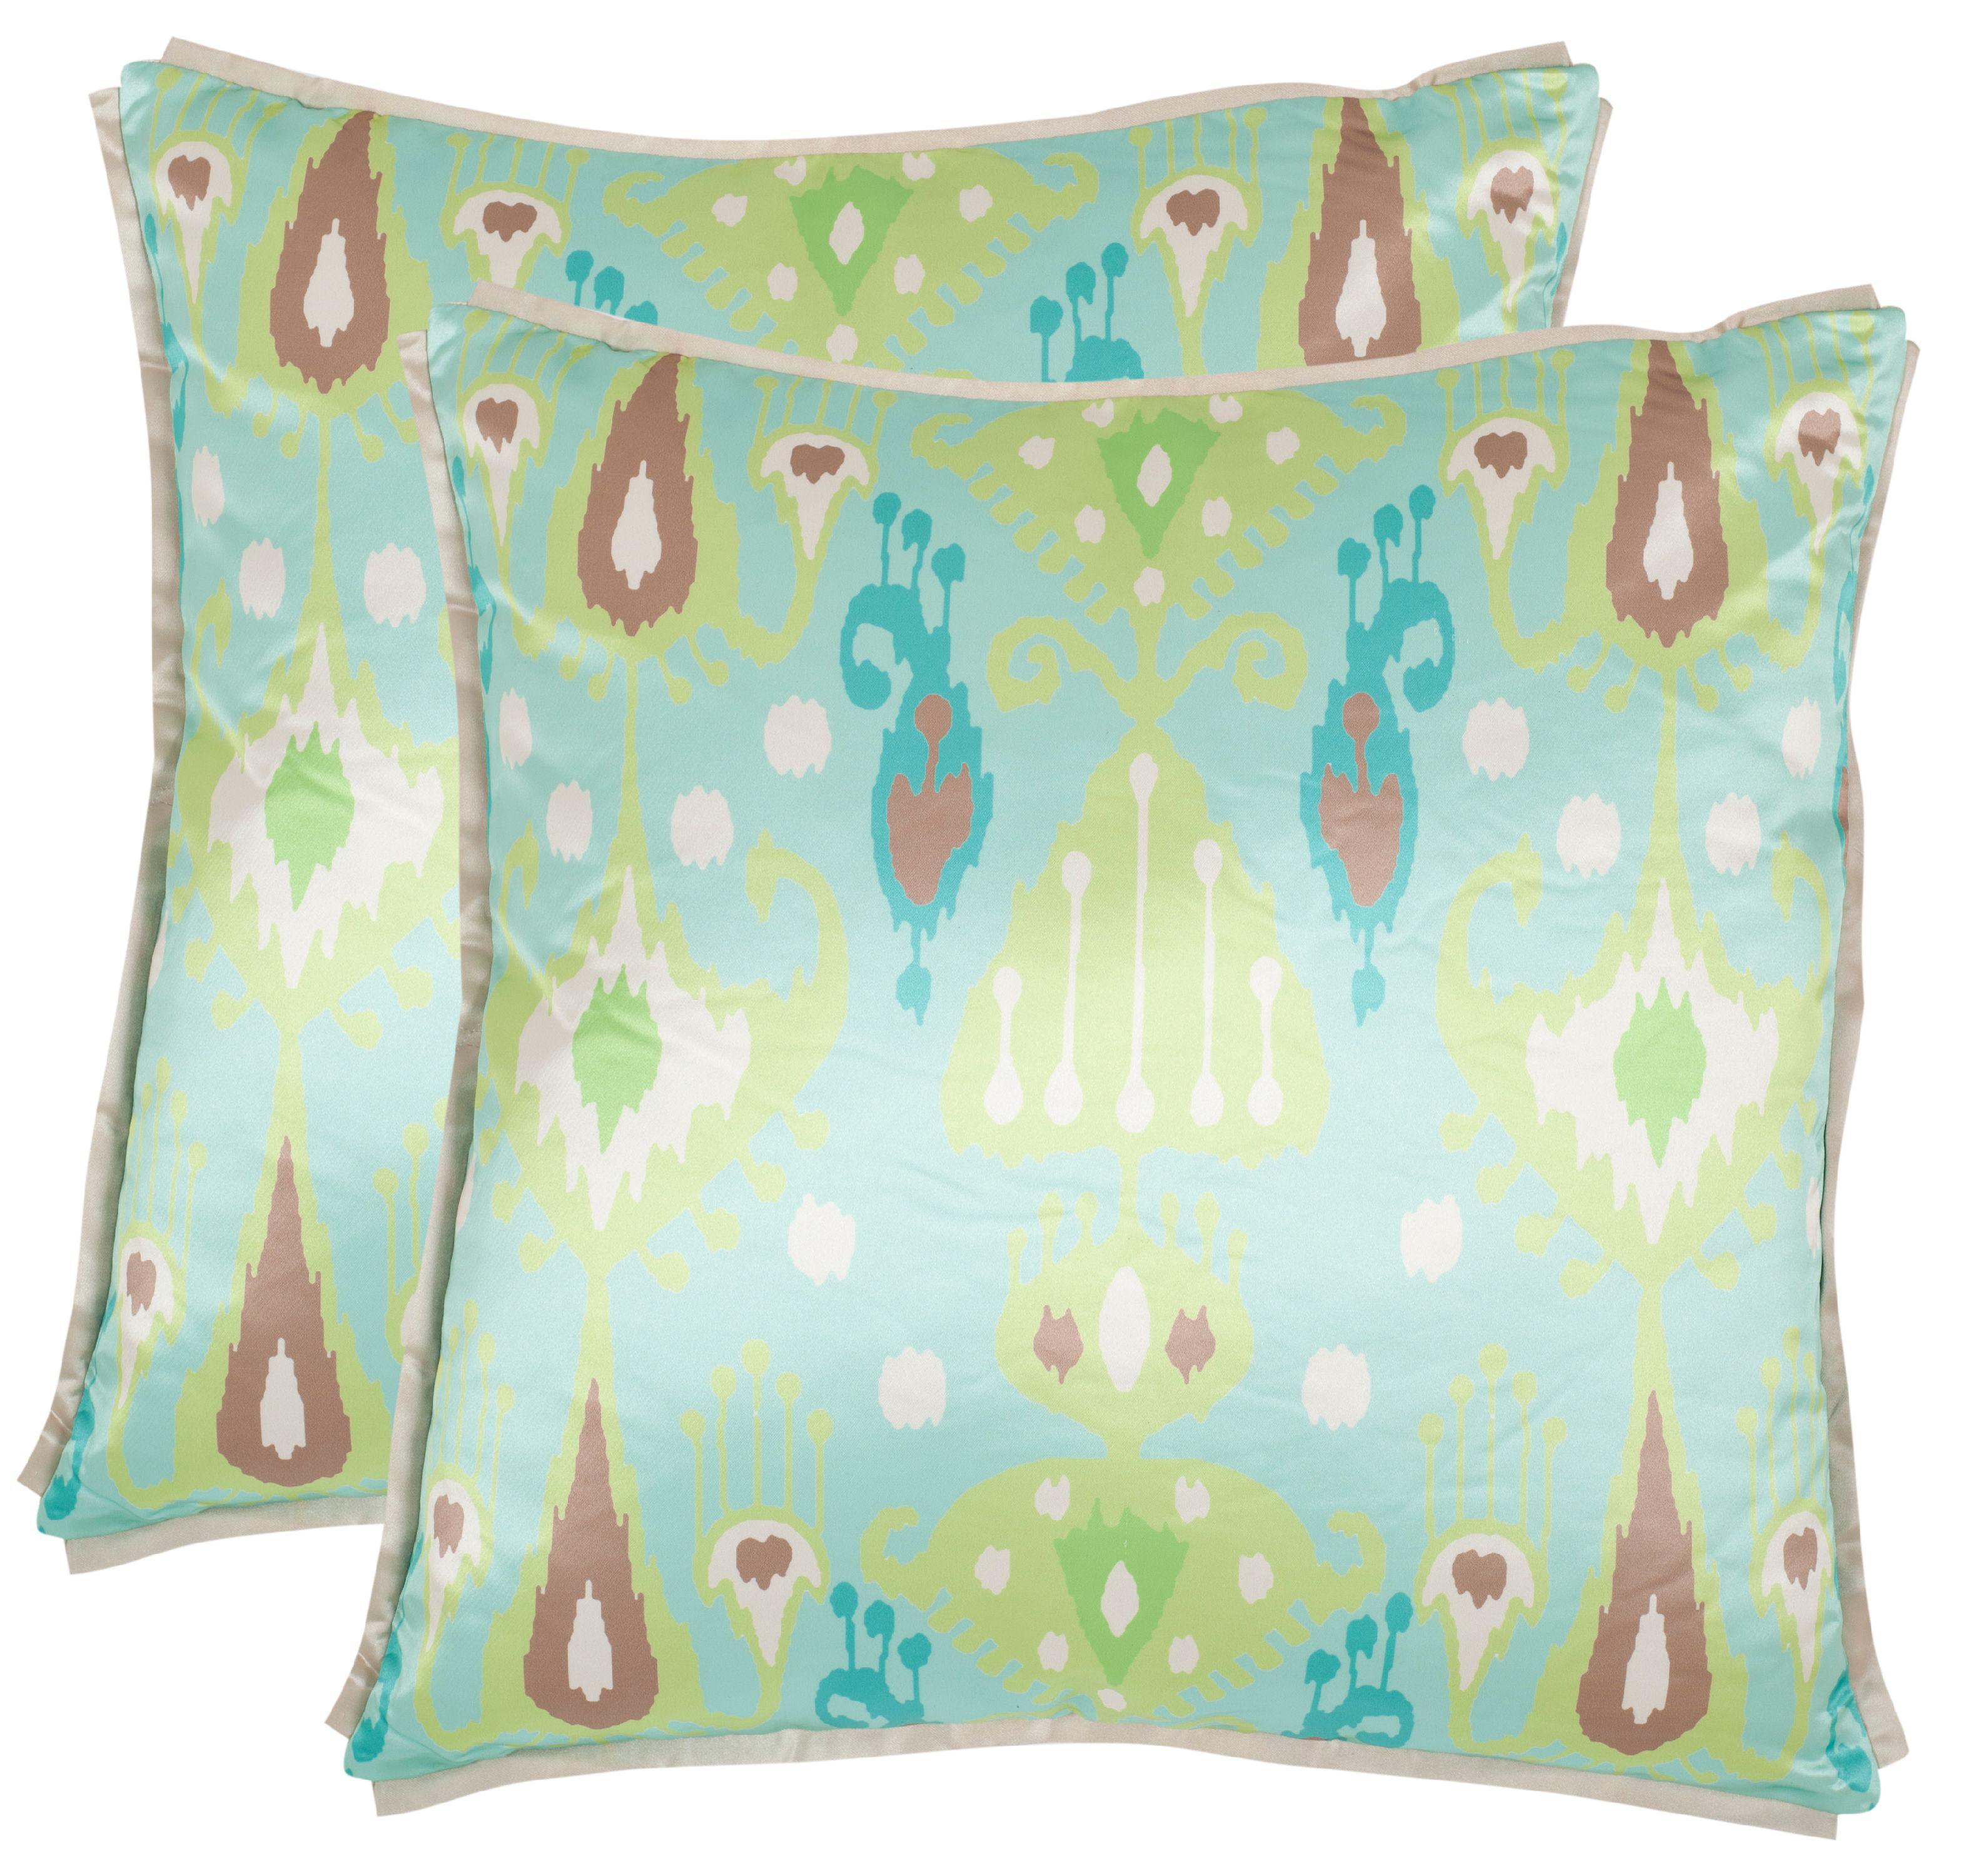 Safavieh Stella Paisley Pillow, Set of 2